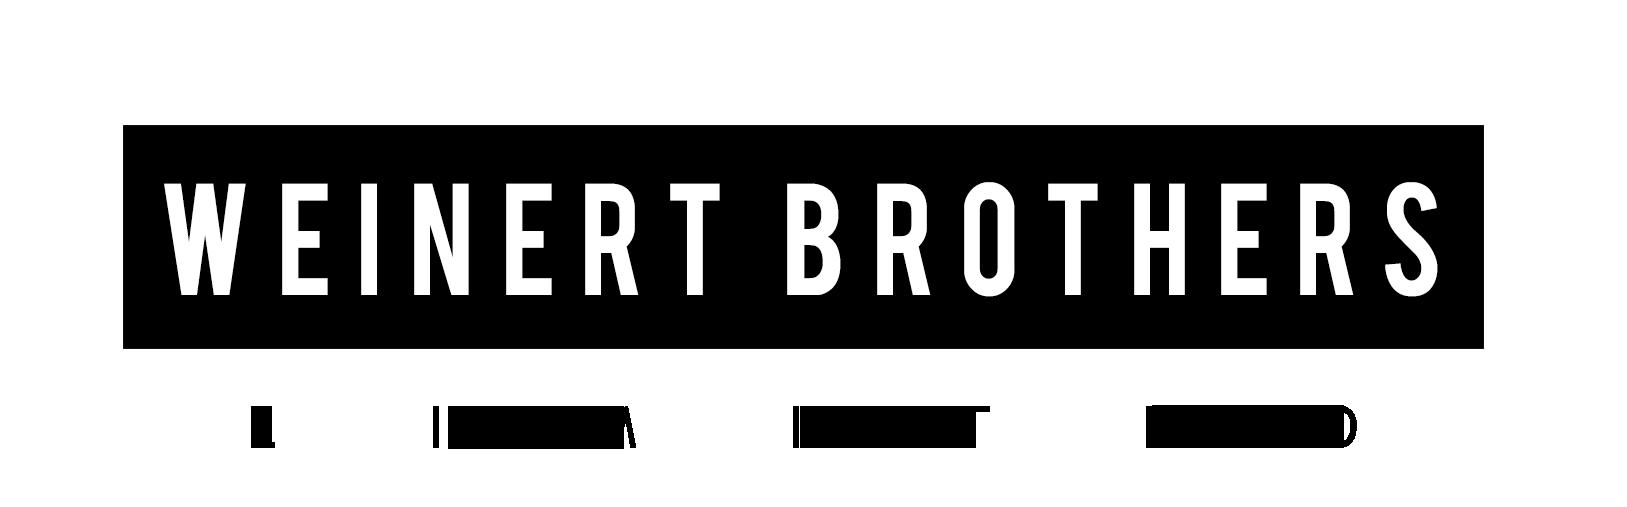 Weinert Brothers Shop